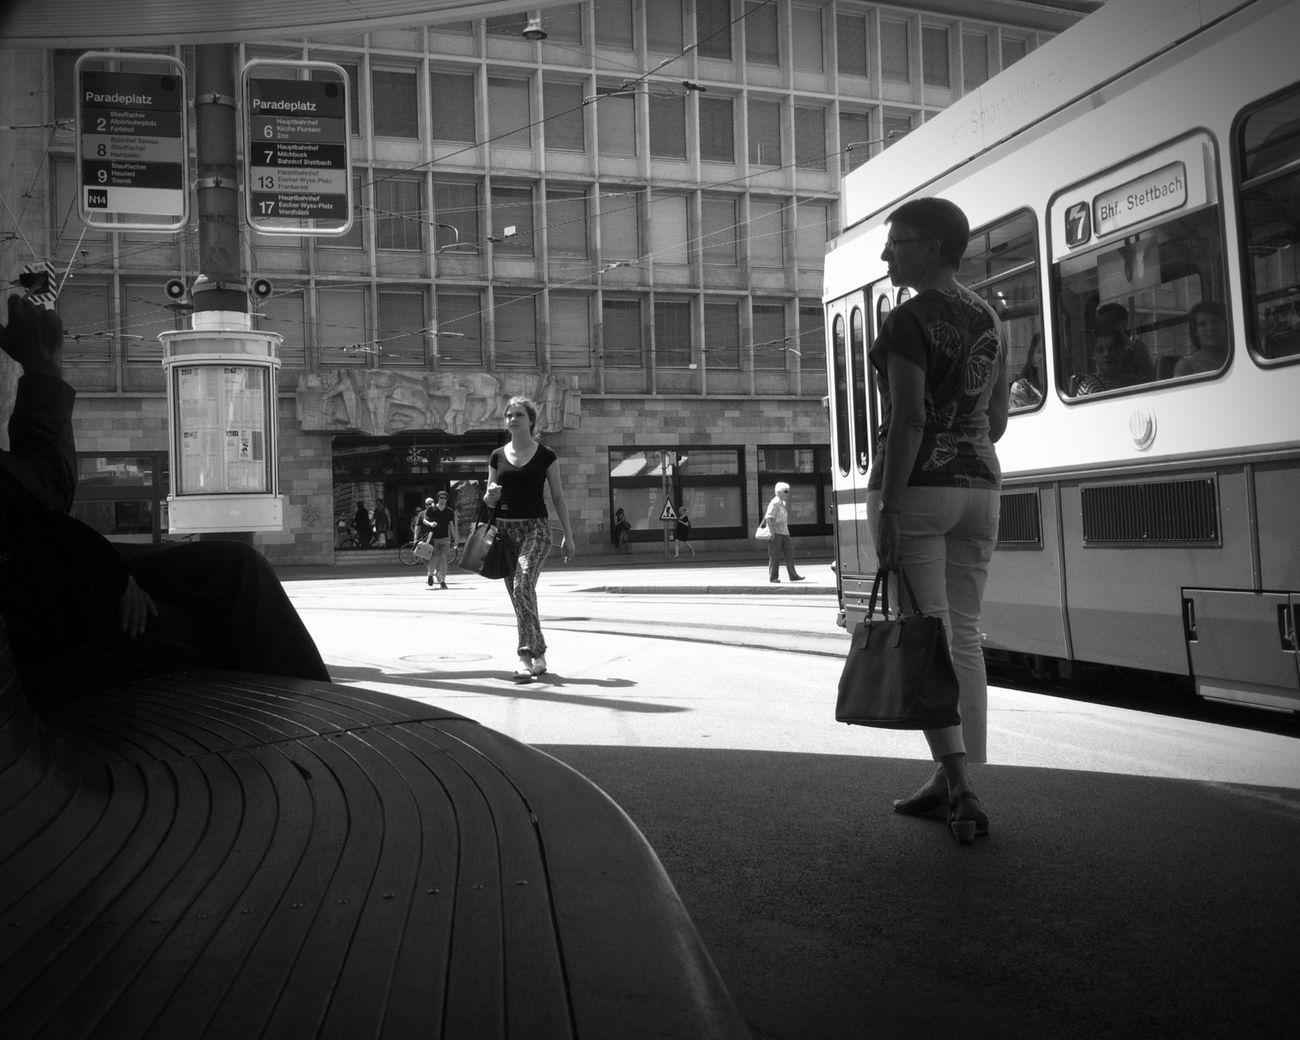 Walking Around Tadaa Tadaa Community Streetphoto_bw Streetphotography Street Photography Bnw_friday_eyeemchallenge The Street Photographer - 2015 EyeEm Awards The Moment - 2015 EyeEm Awards